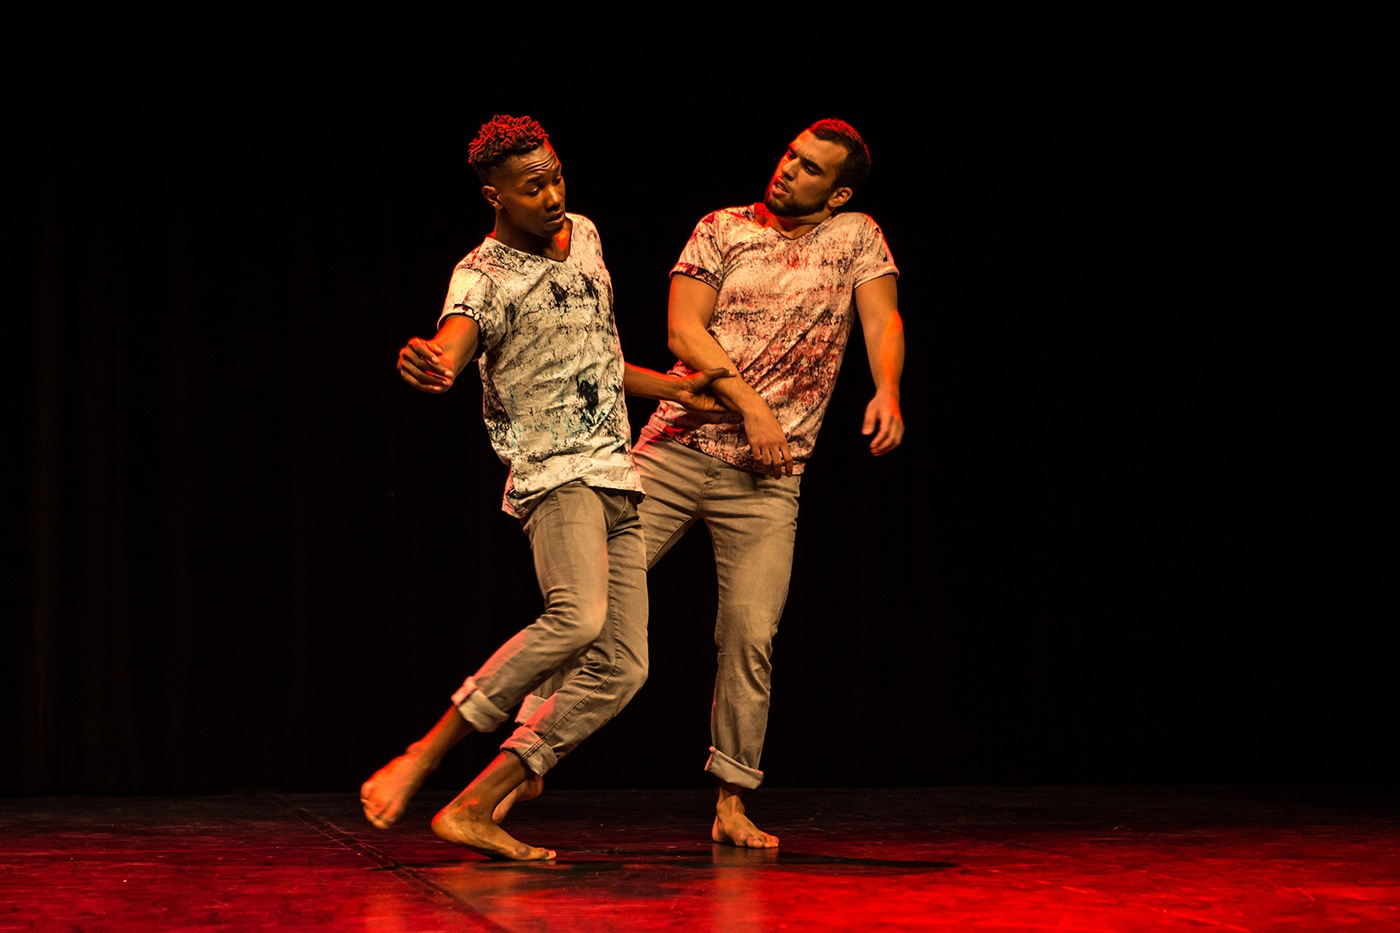 photographe-reportage-danse-avec-ton-crous-guillaume-heraud-019-small